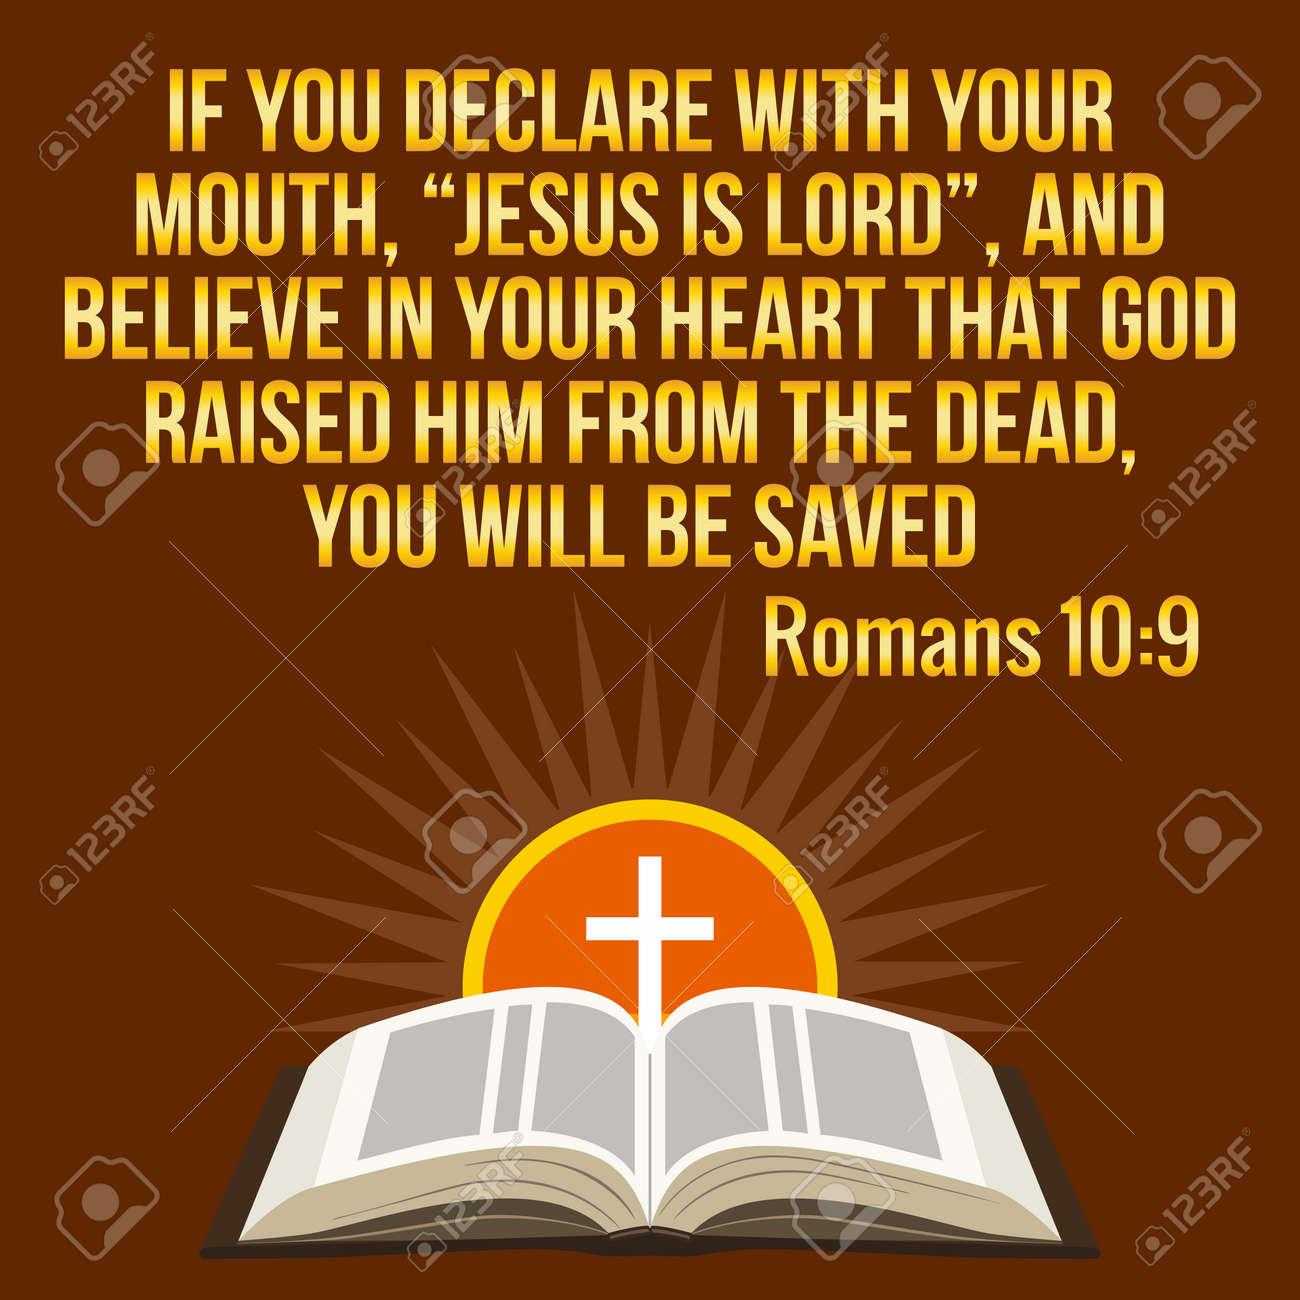 Christian motivational quote bible verse cross and shining christian motivational quote bible verse cross and shining sun resurrection concept symbols buycottarizona Images